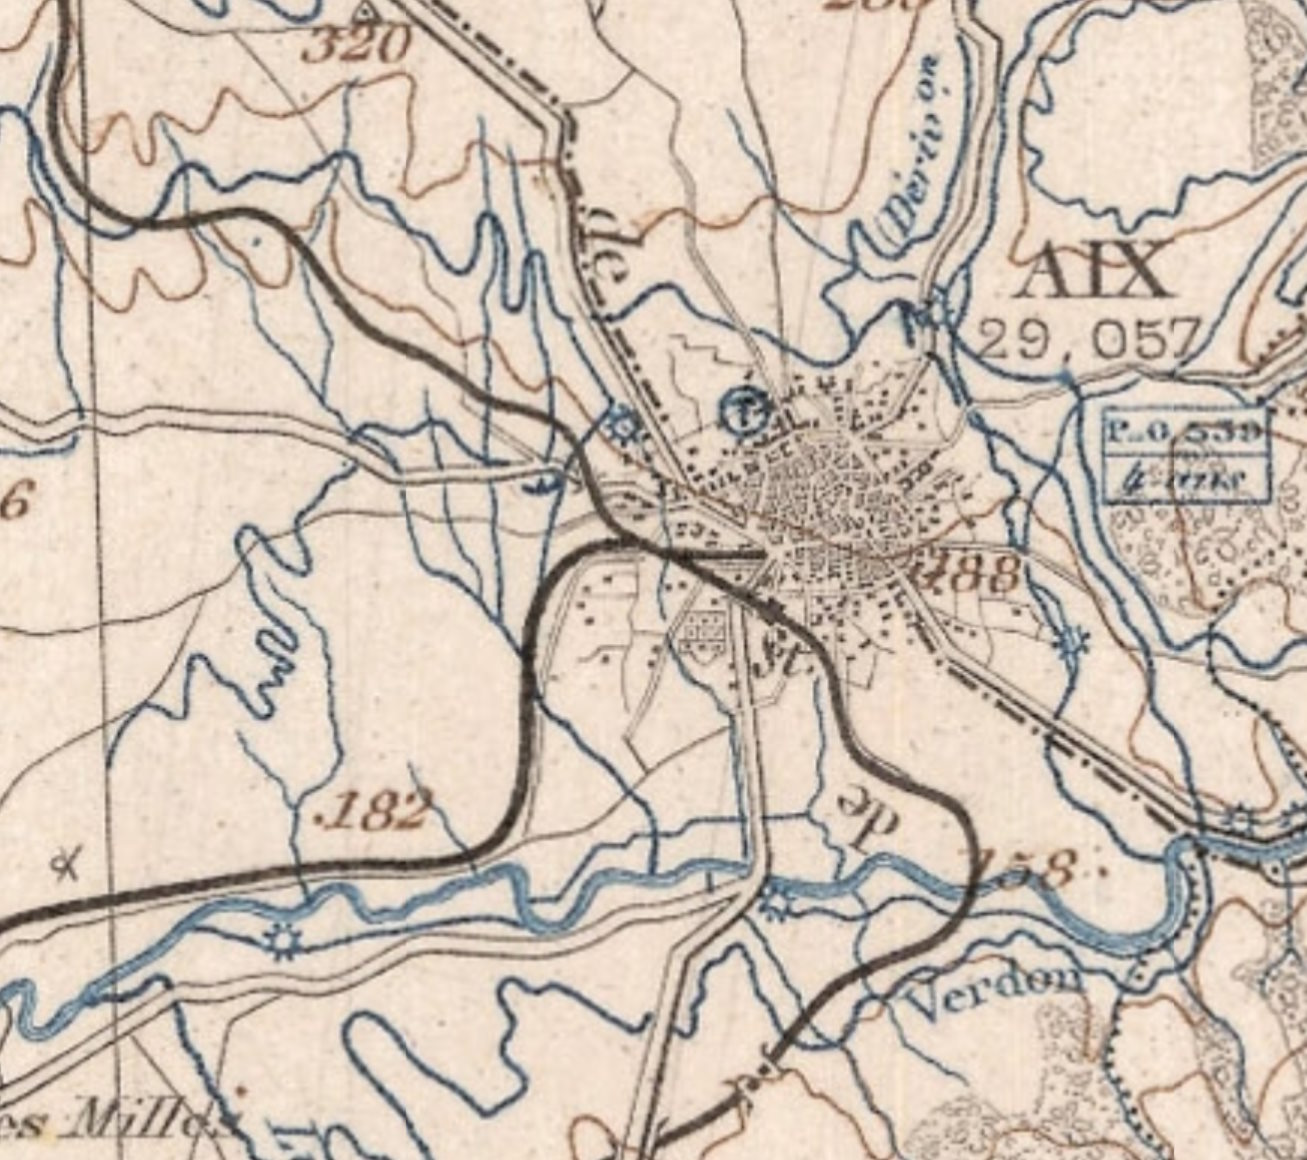 encagnane-1889